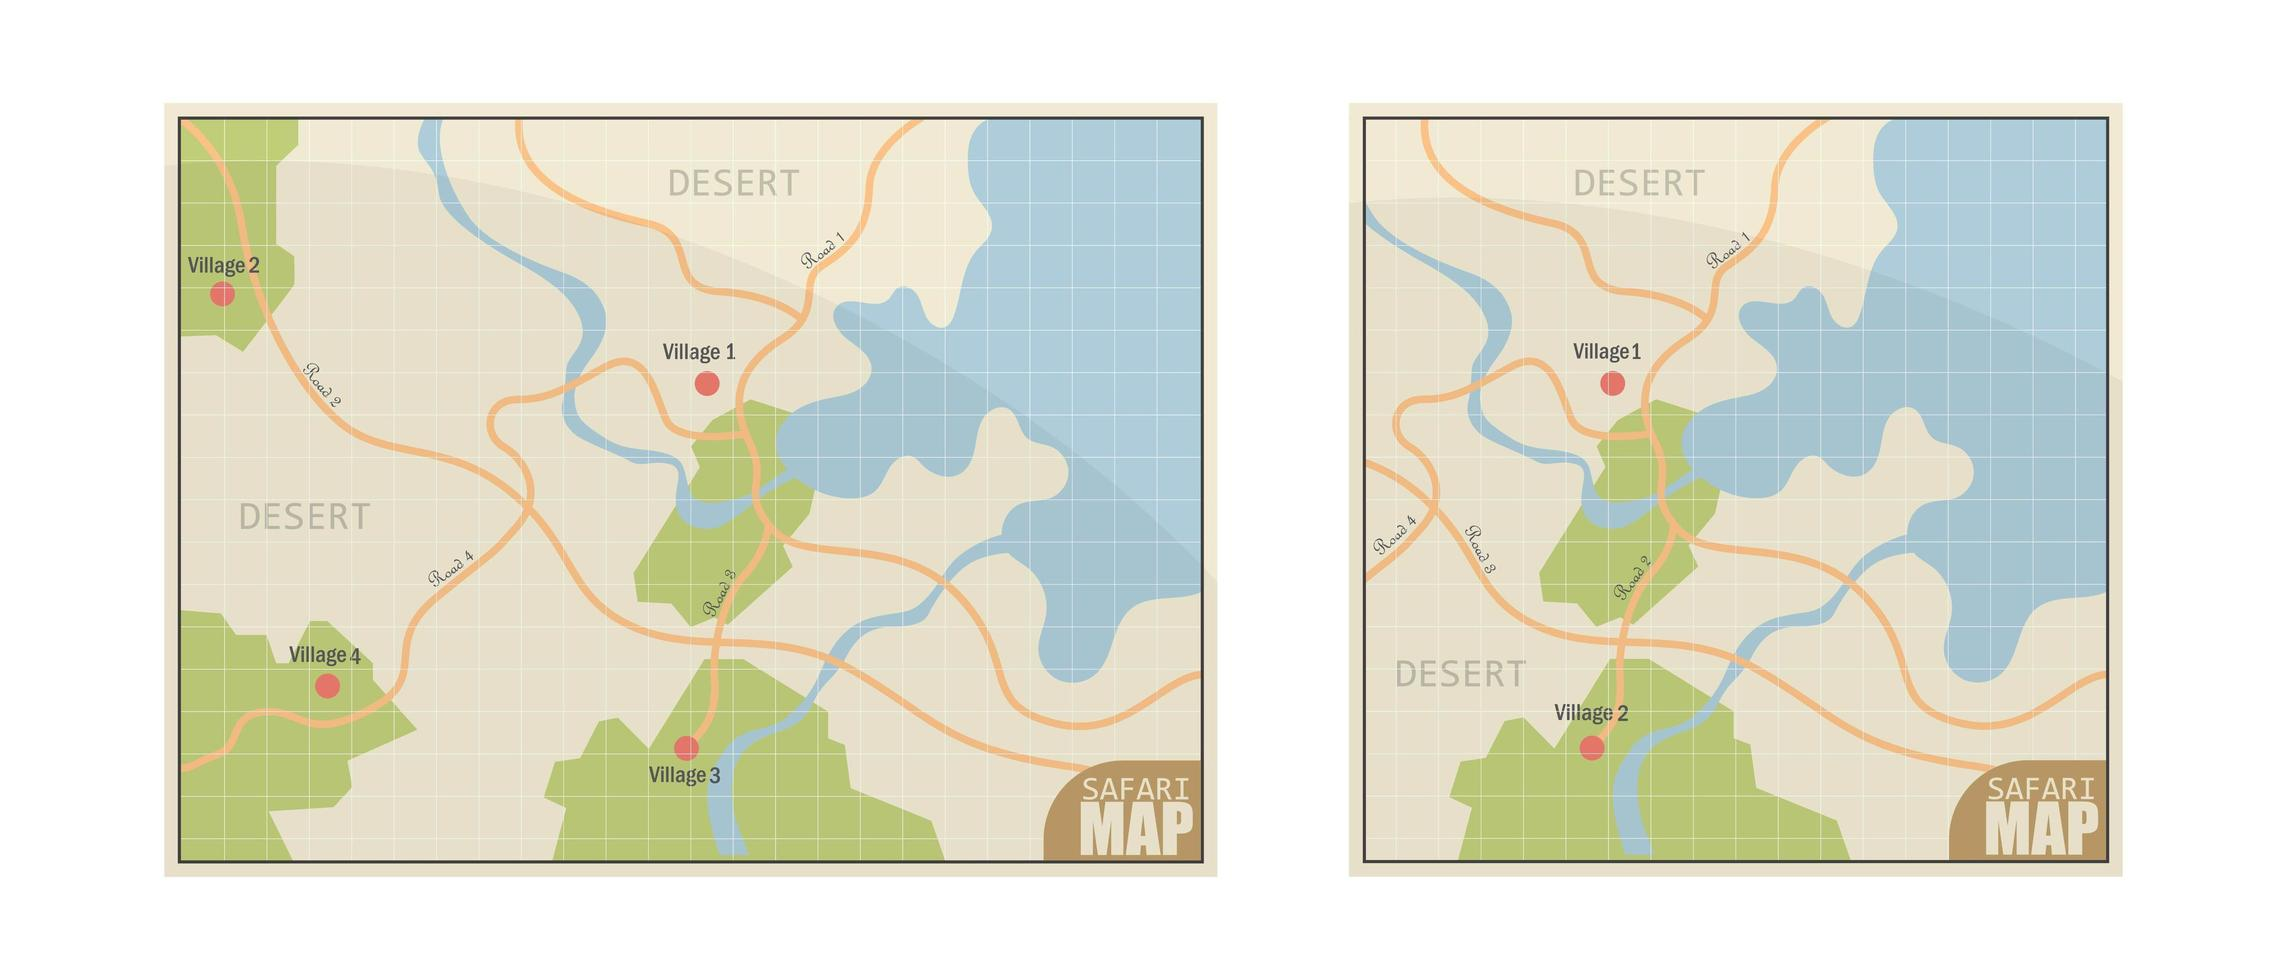 Safari Map on White vector